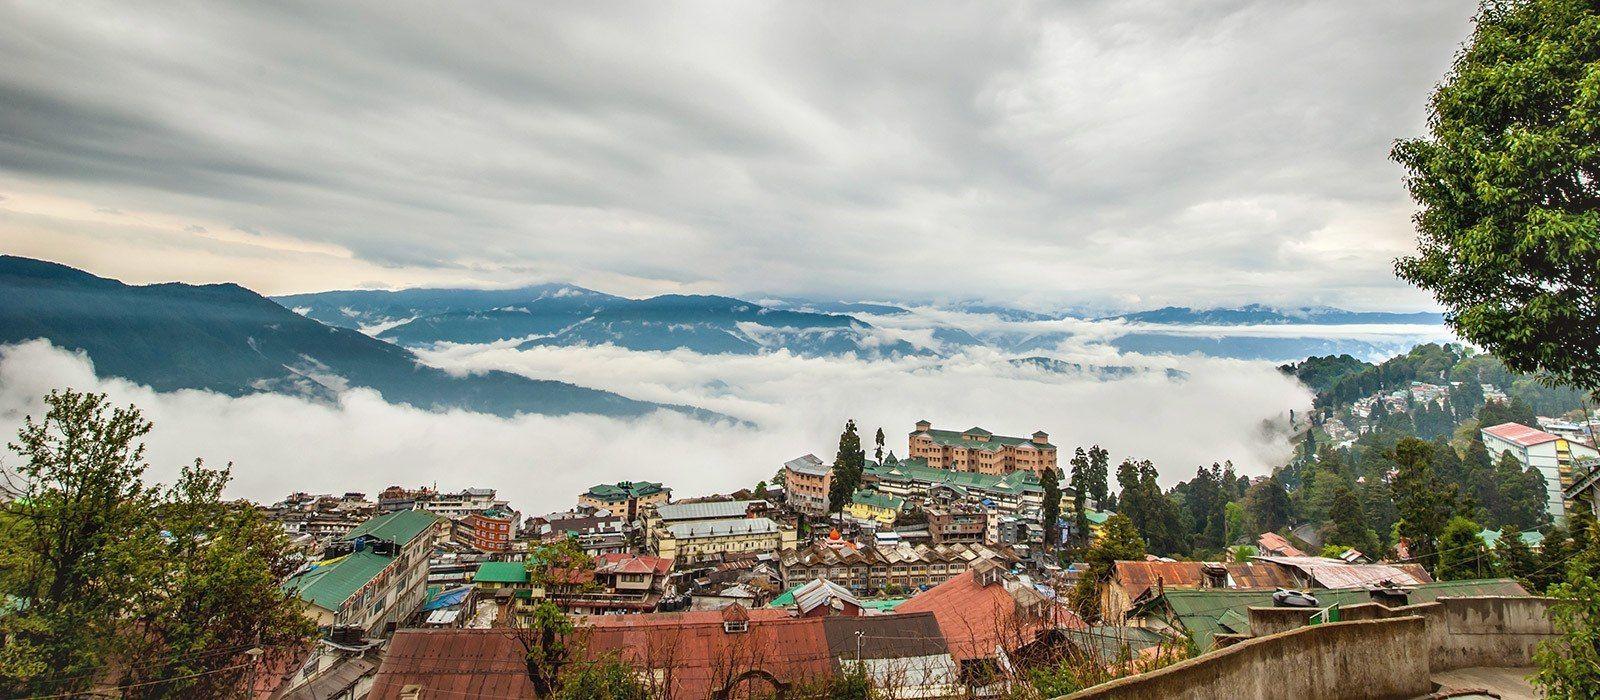 Destination Darjeeling Himalayas